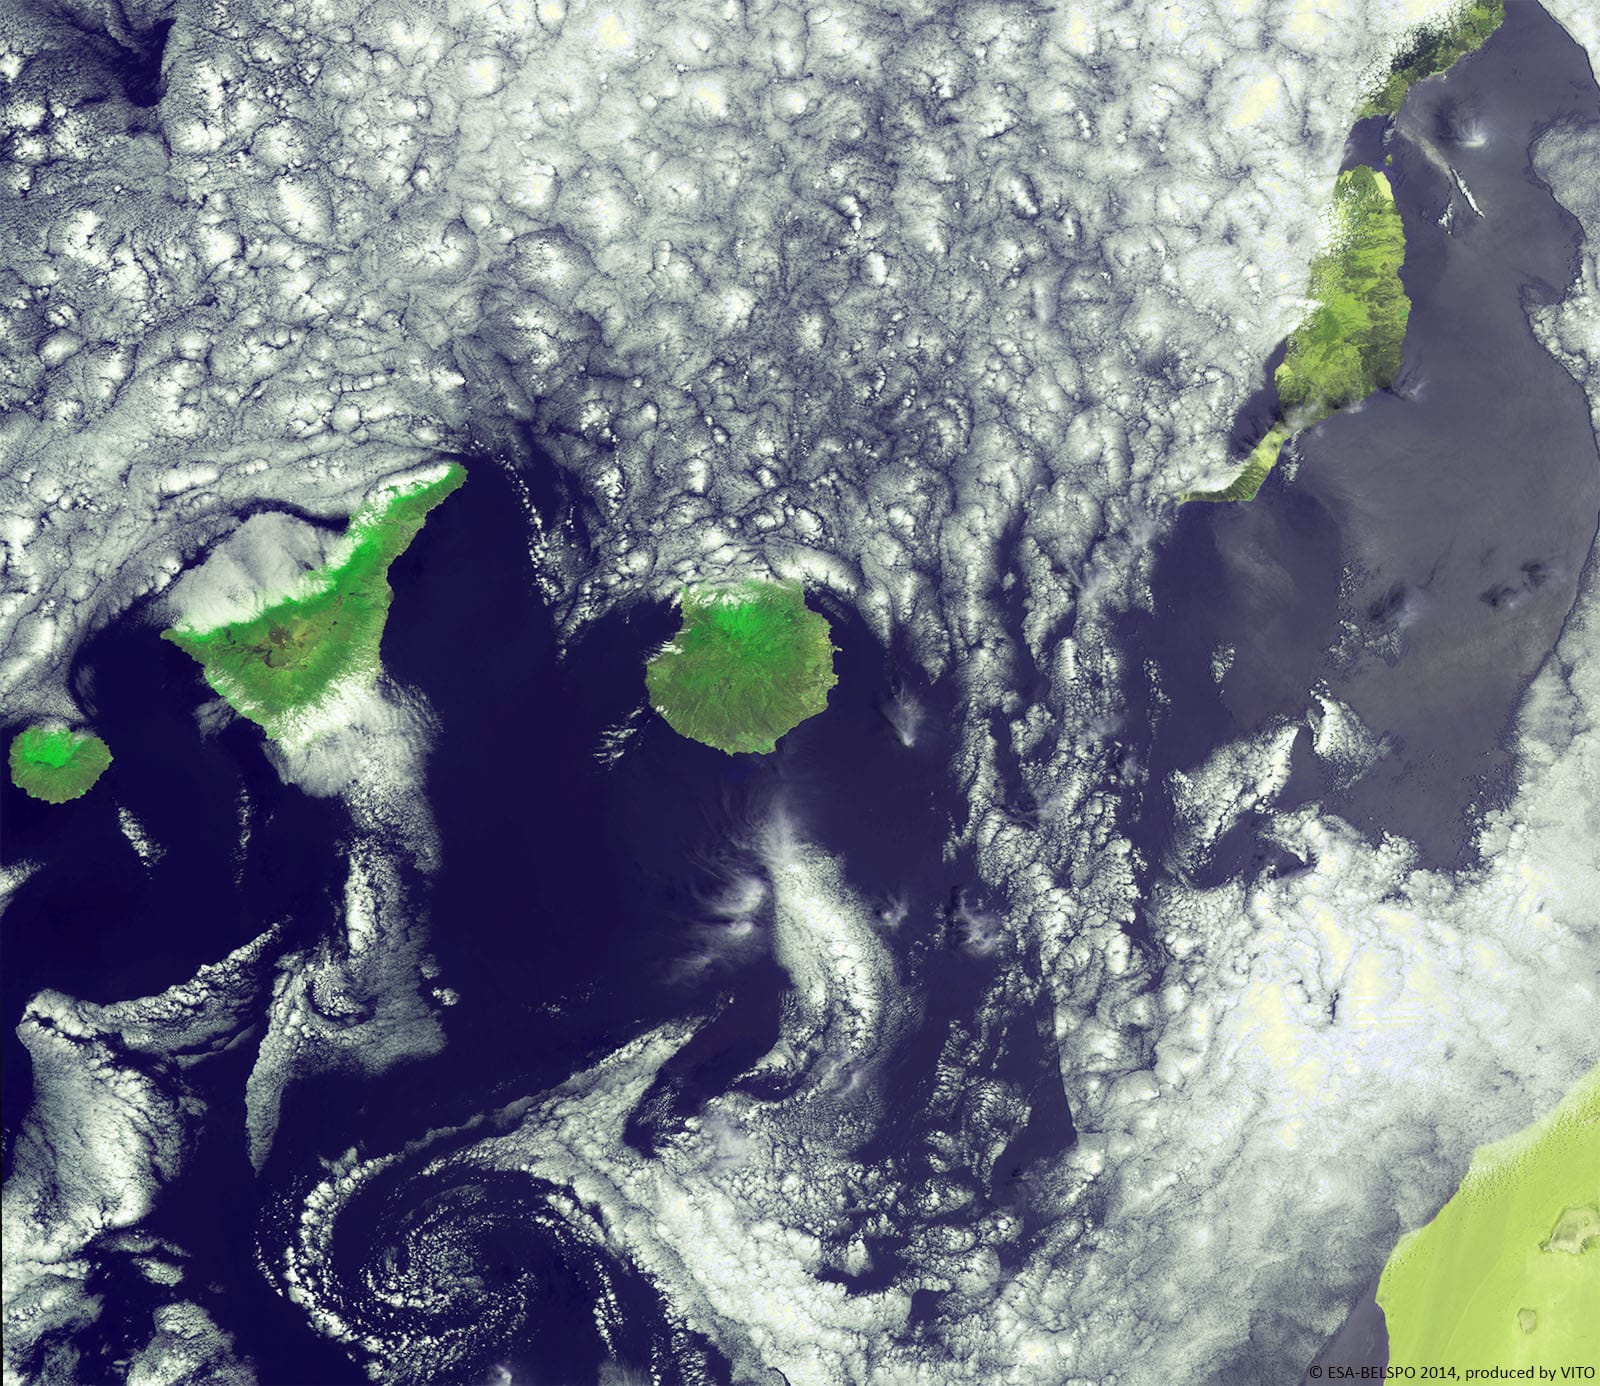 De Canarische eilanden gefotografeerd door PROBA-V., ESA/Belspo/VITO